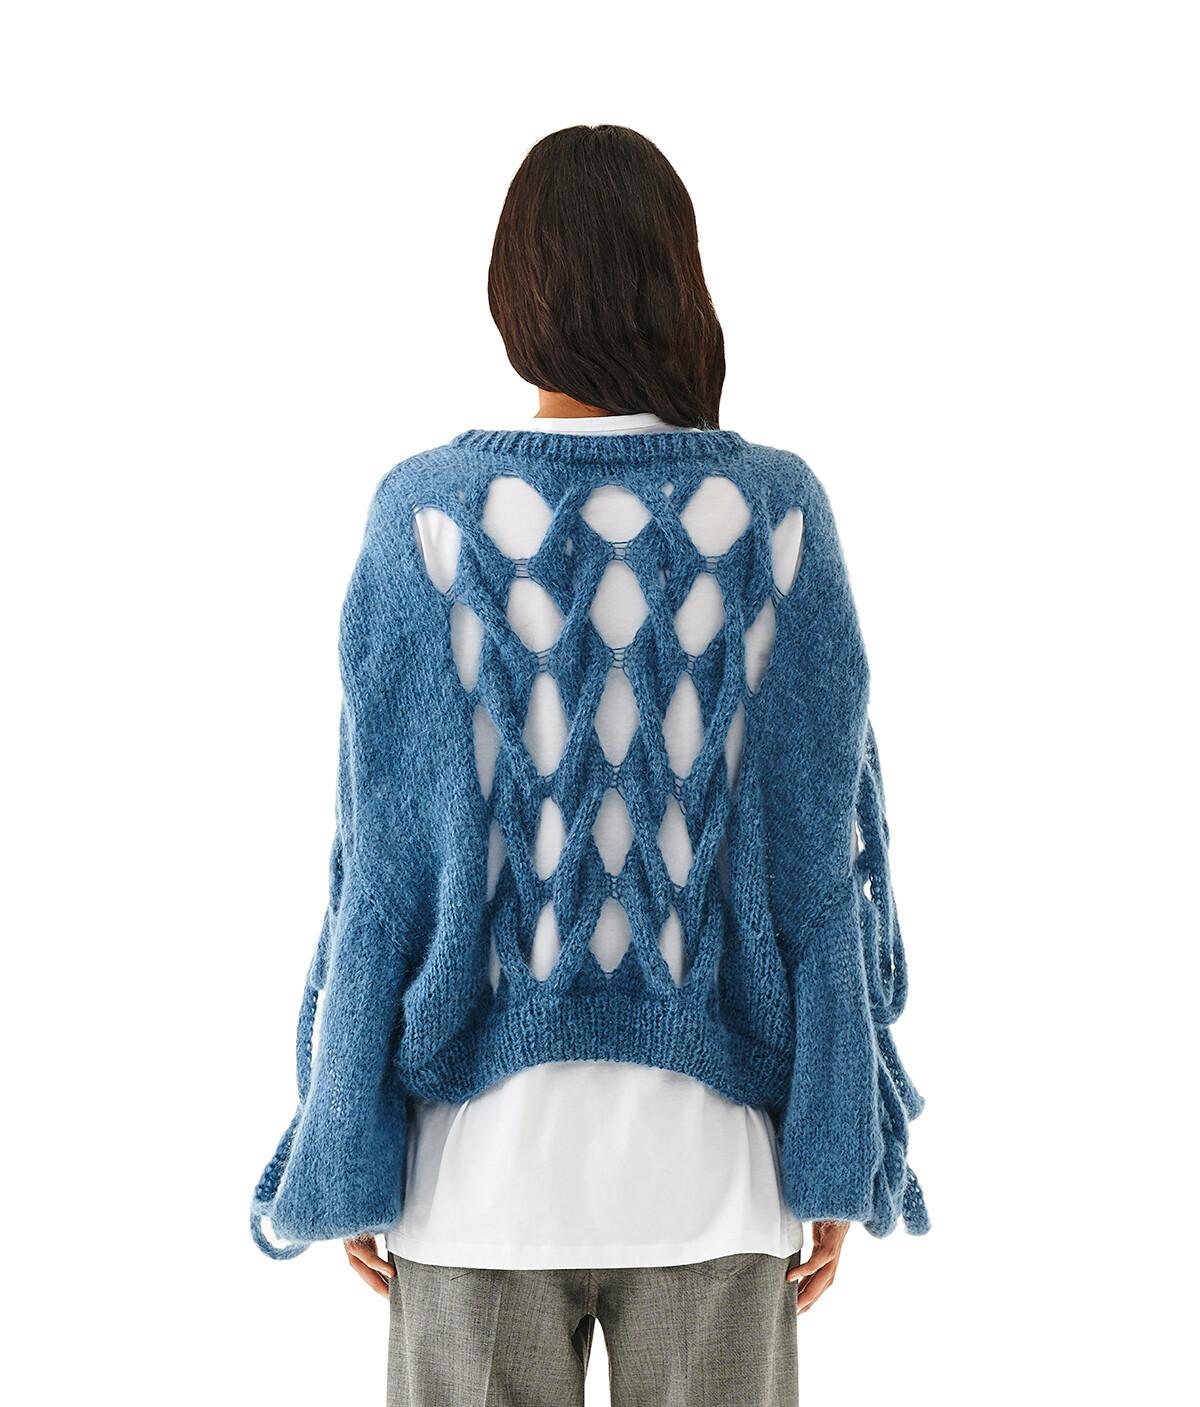 LOEWE Knit Mesh Sweater Blue front